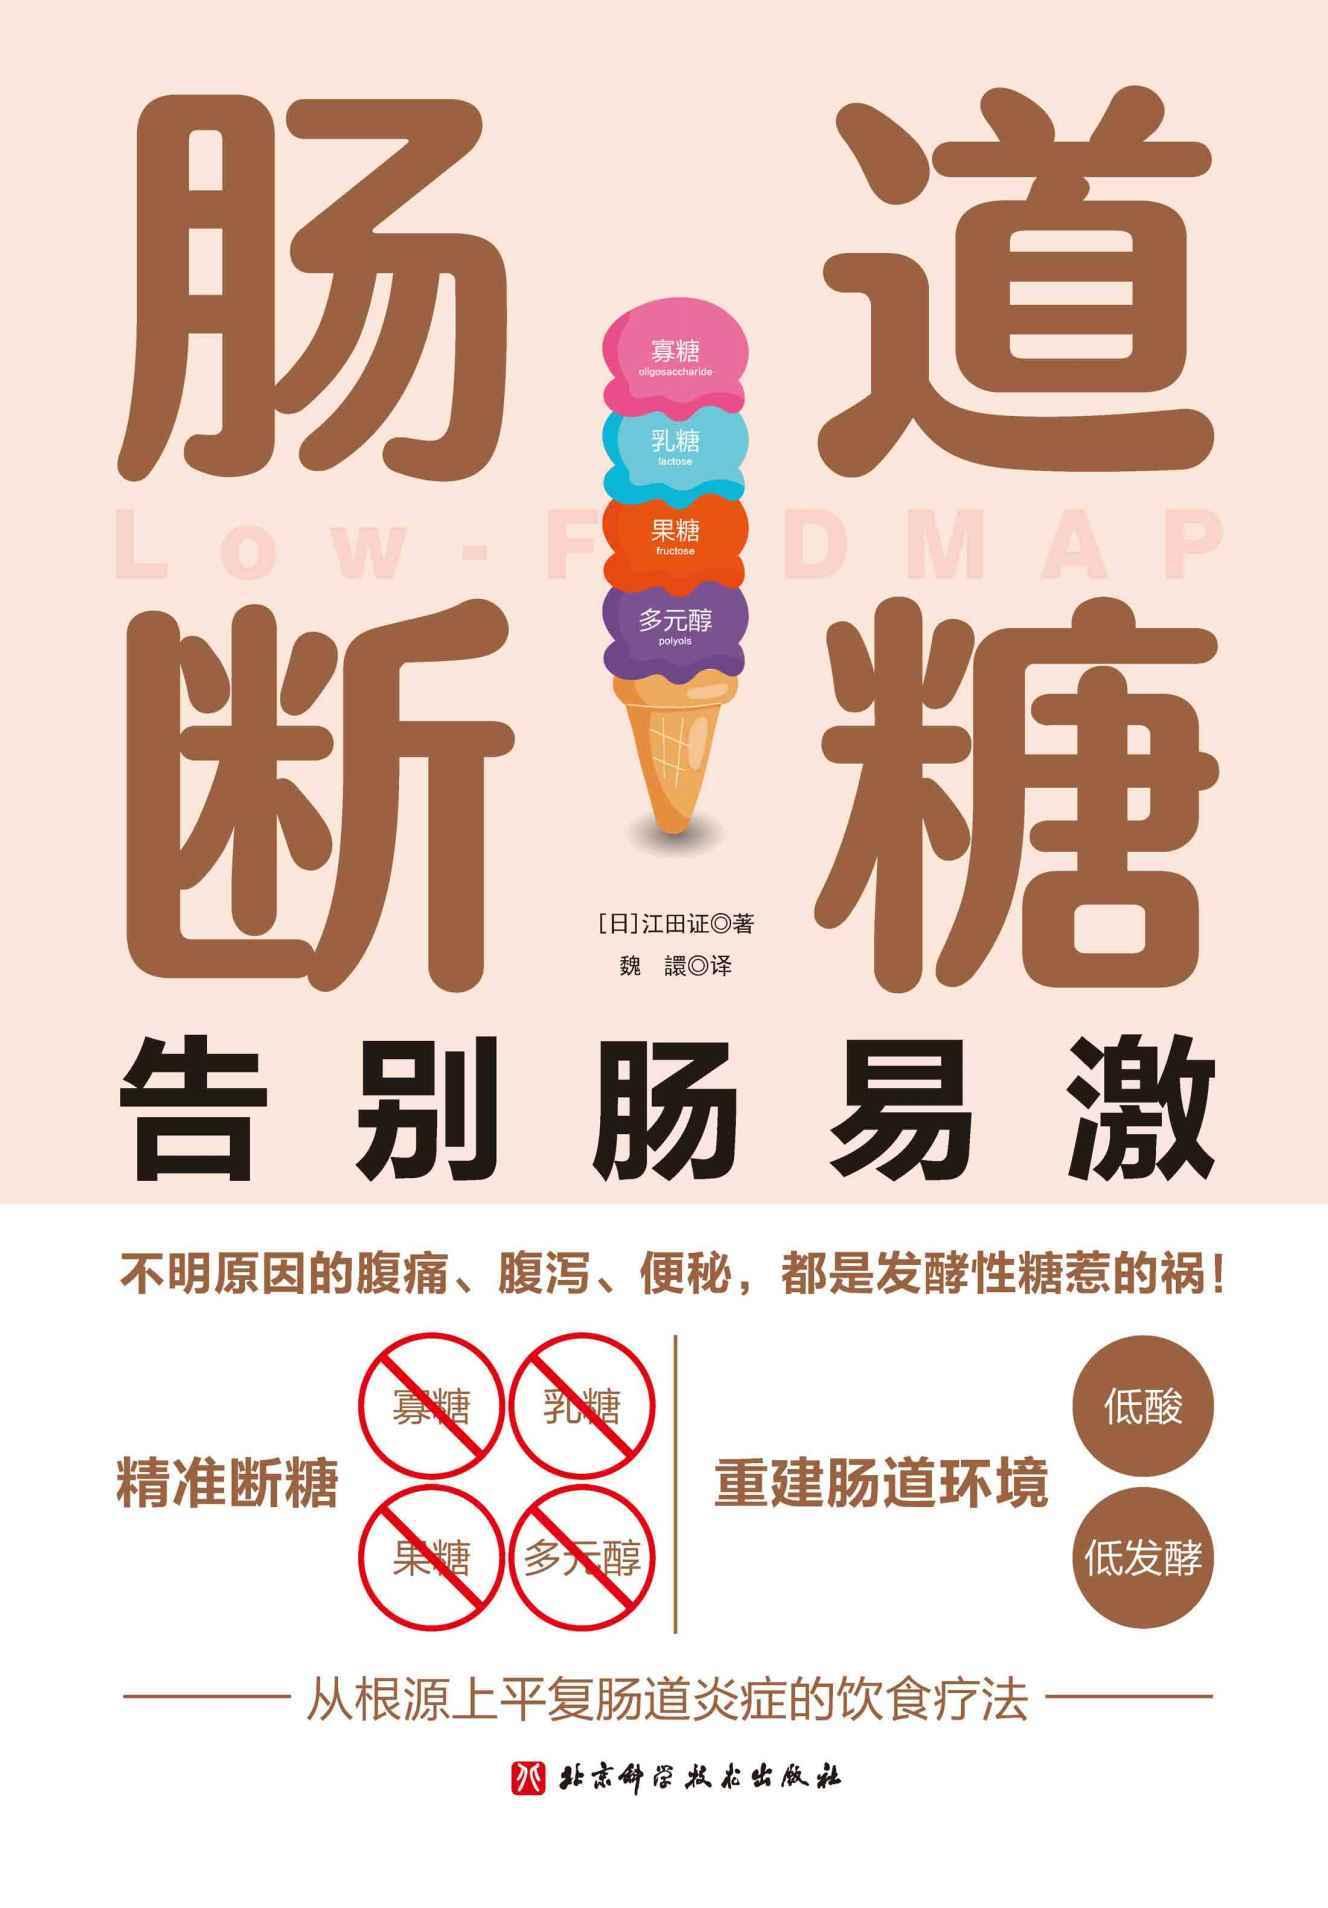 肠道断糖pdf-epub-mobi-txt-azw3